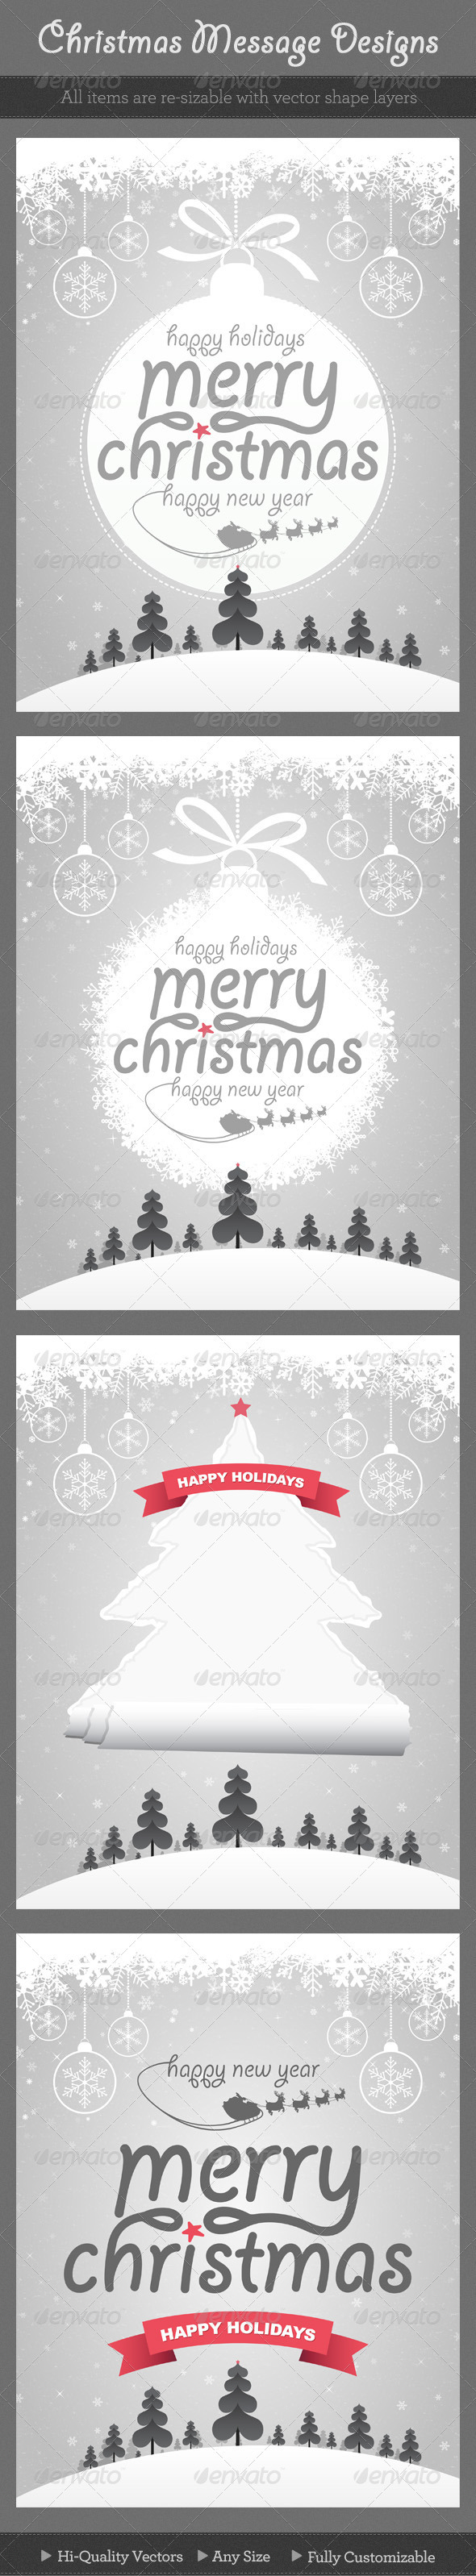 GraphicRiver Christmas Message Designs 3409680